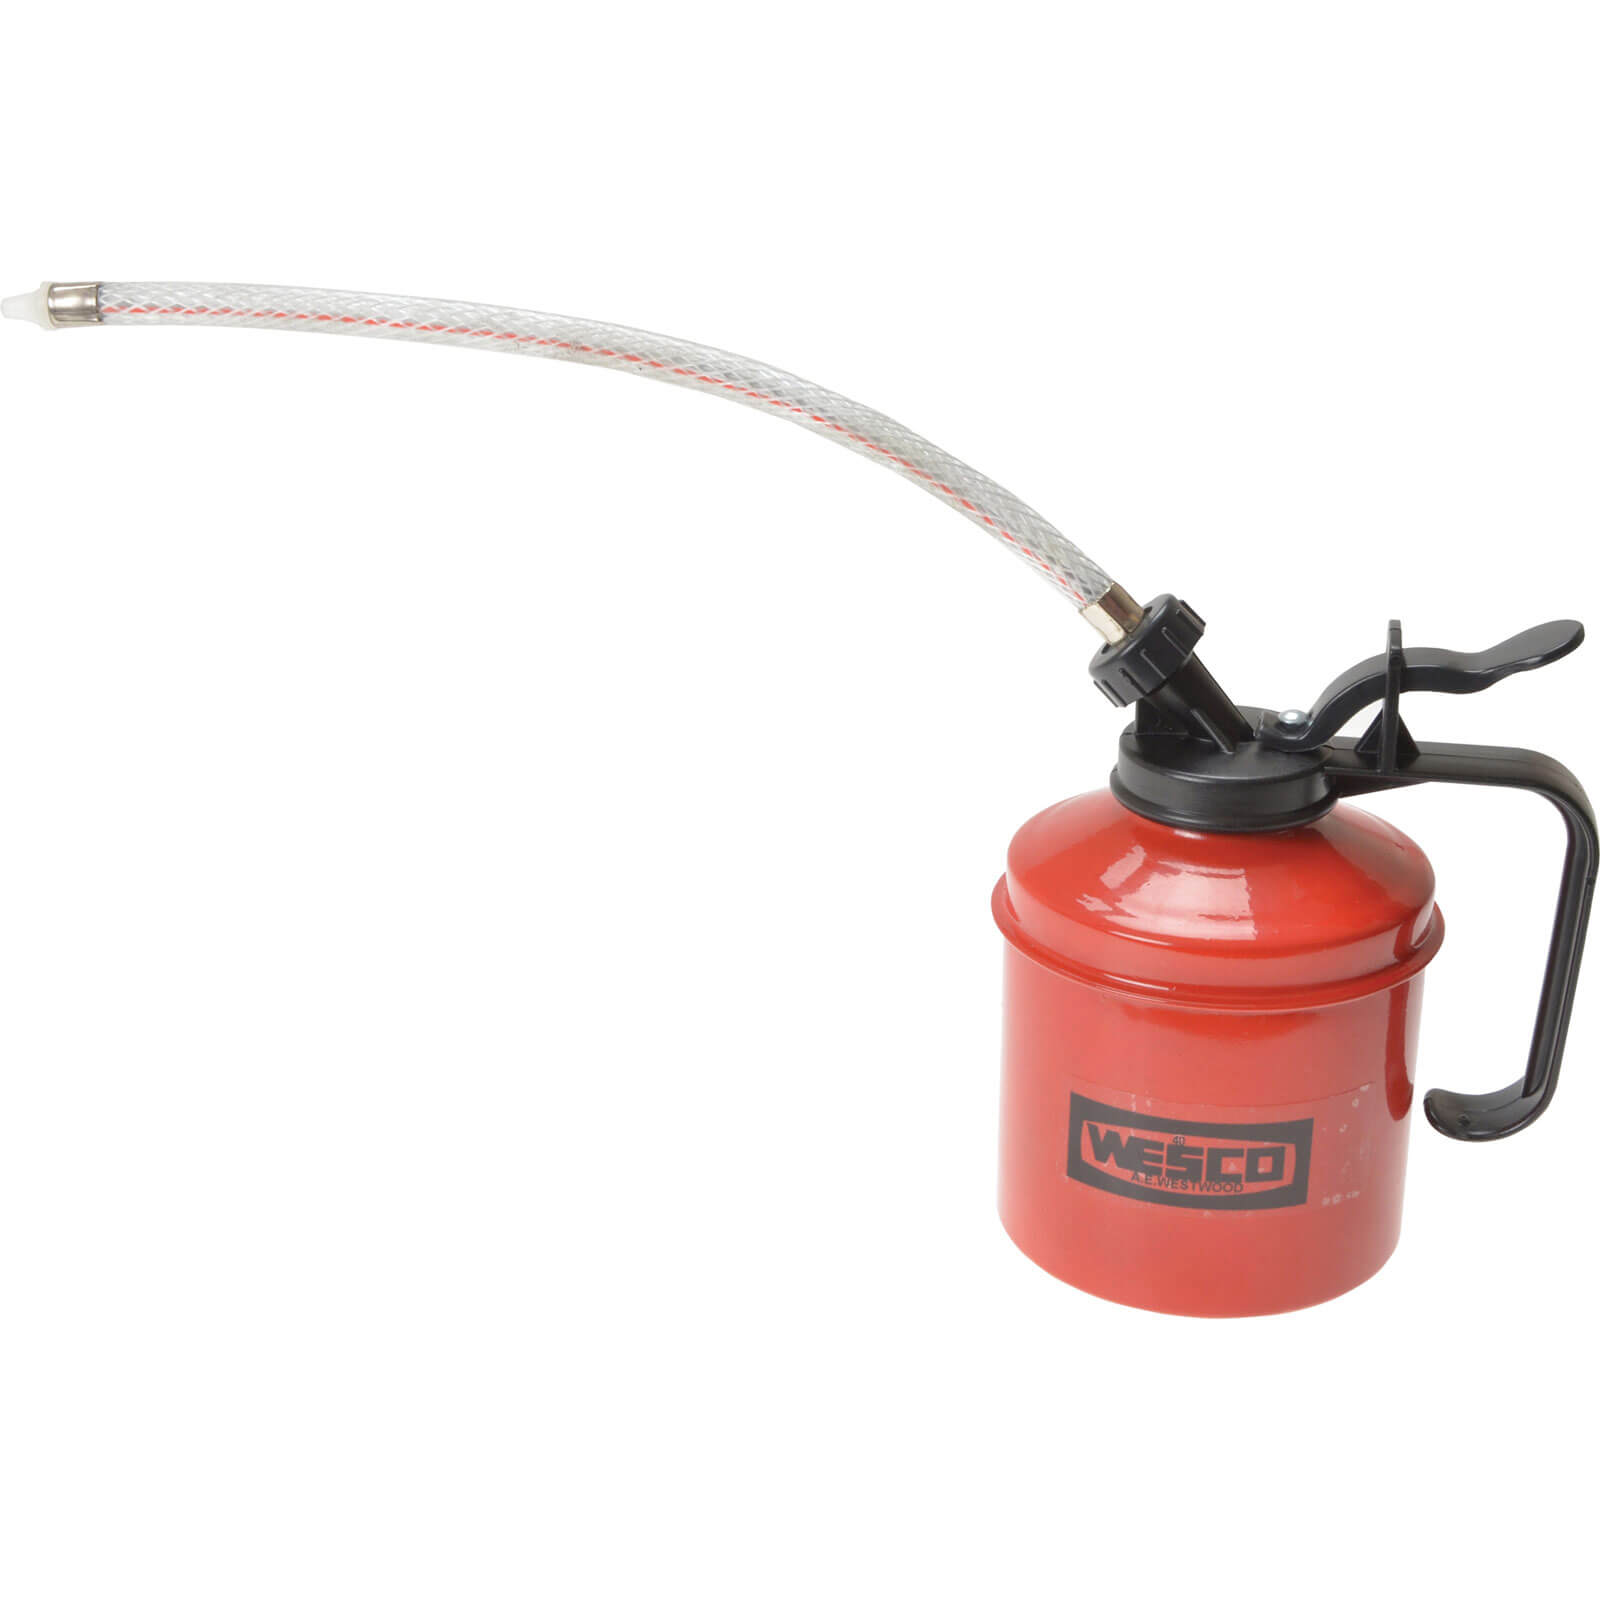 Wesco Metal Oil Can & Flexible Spout 500ml